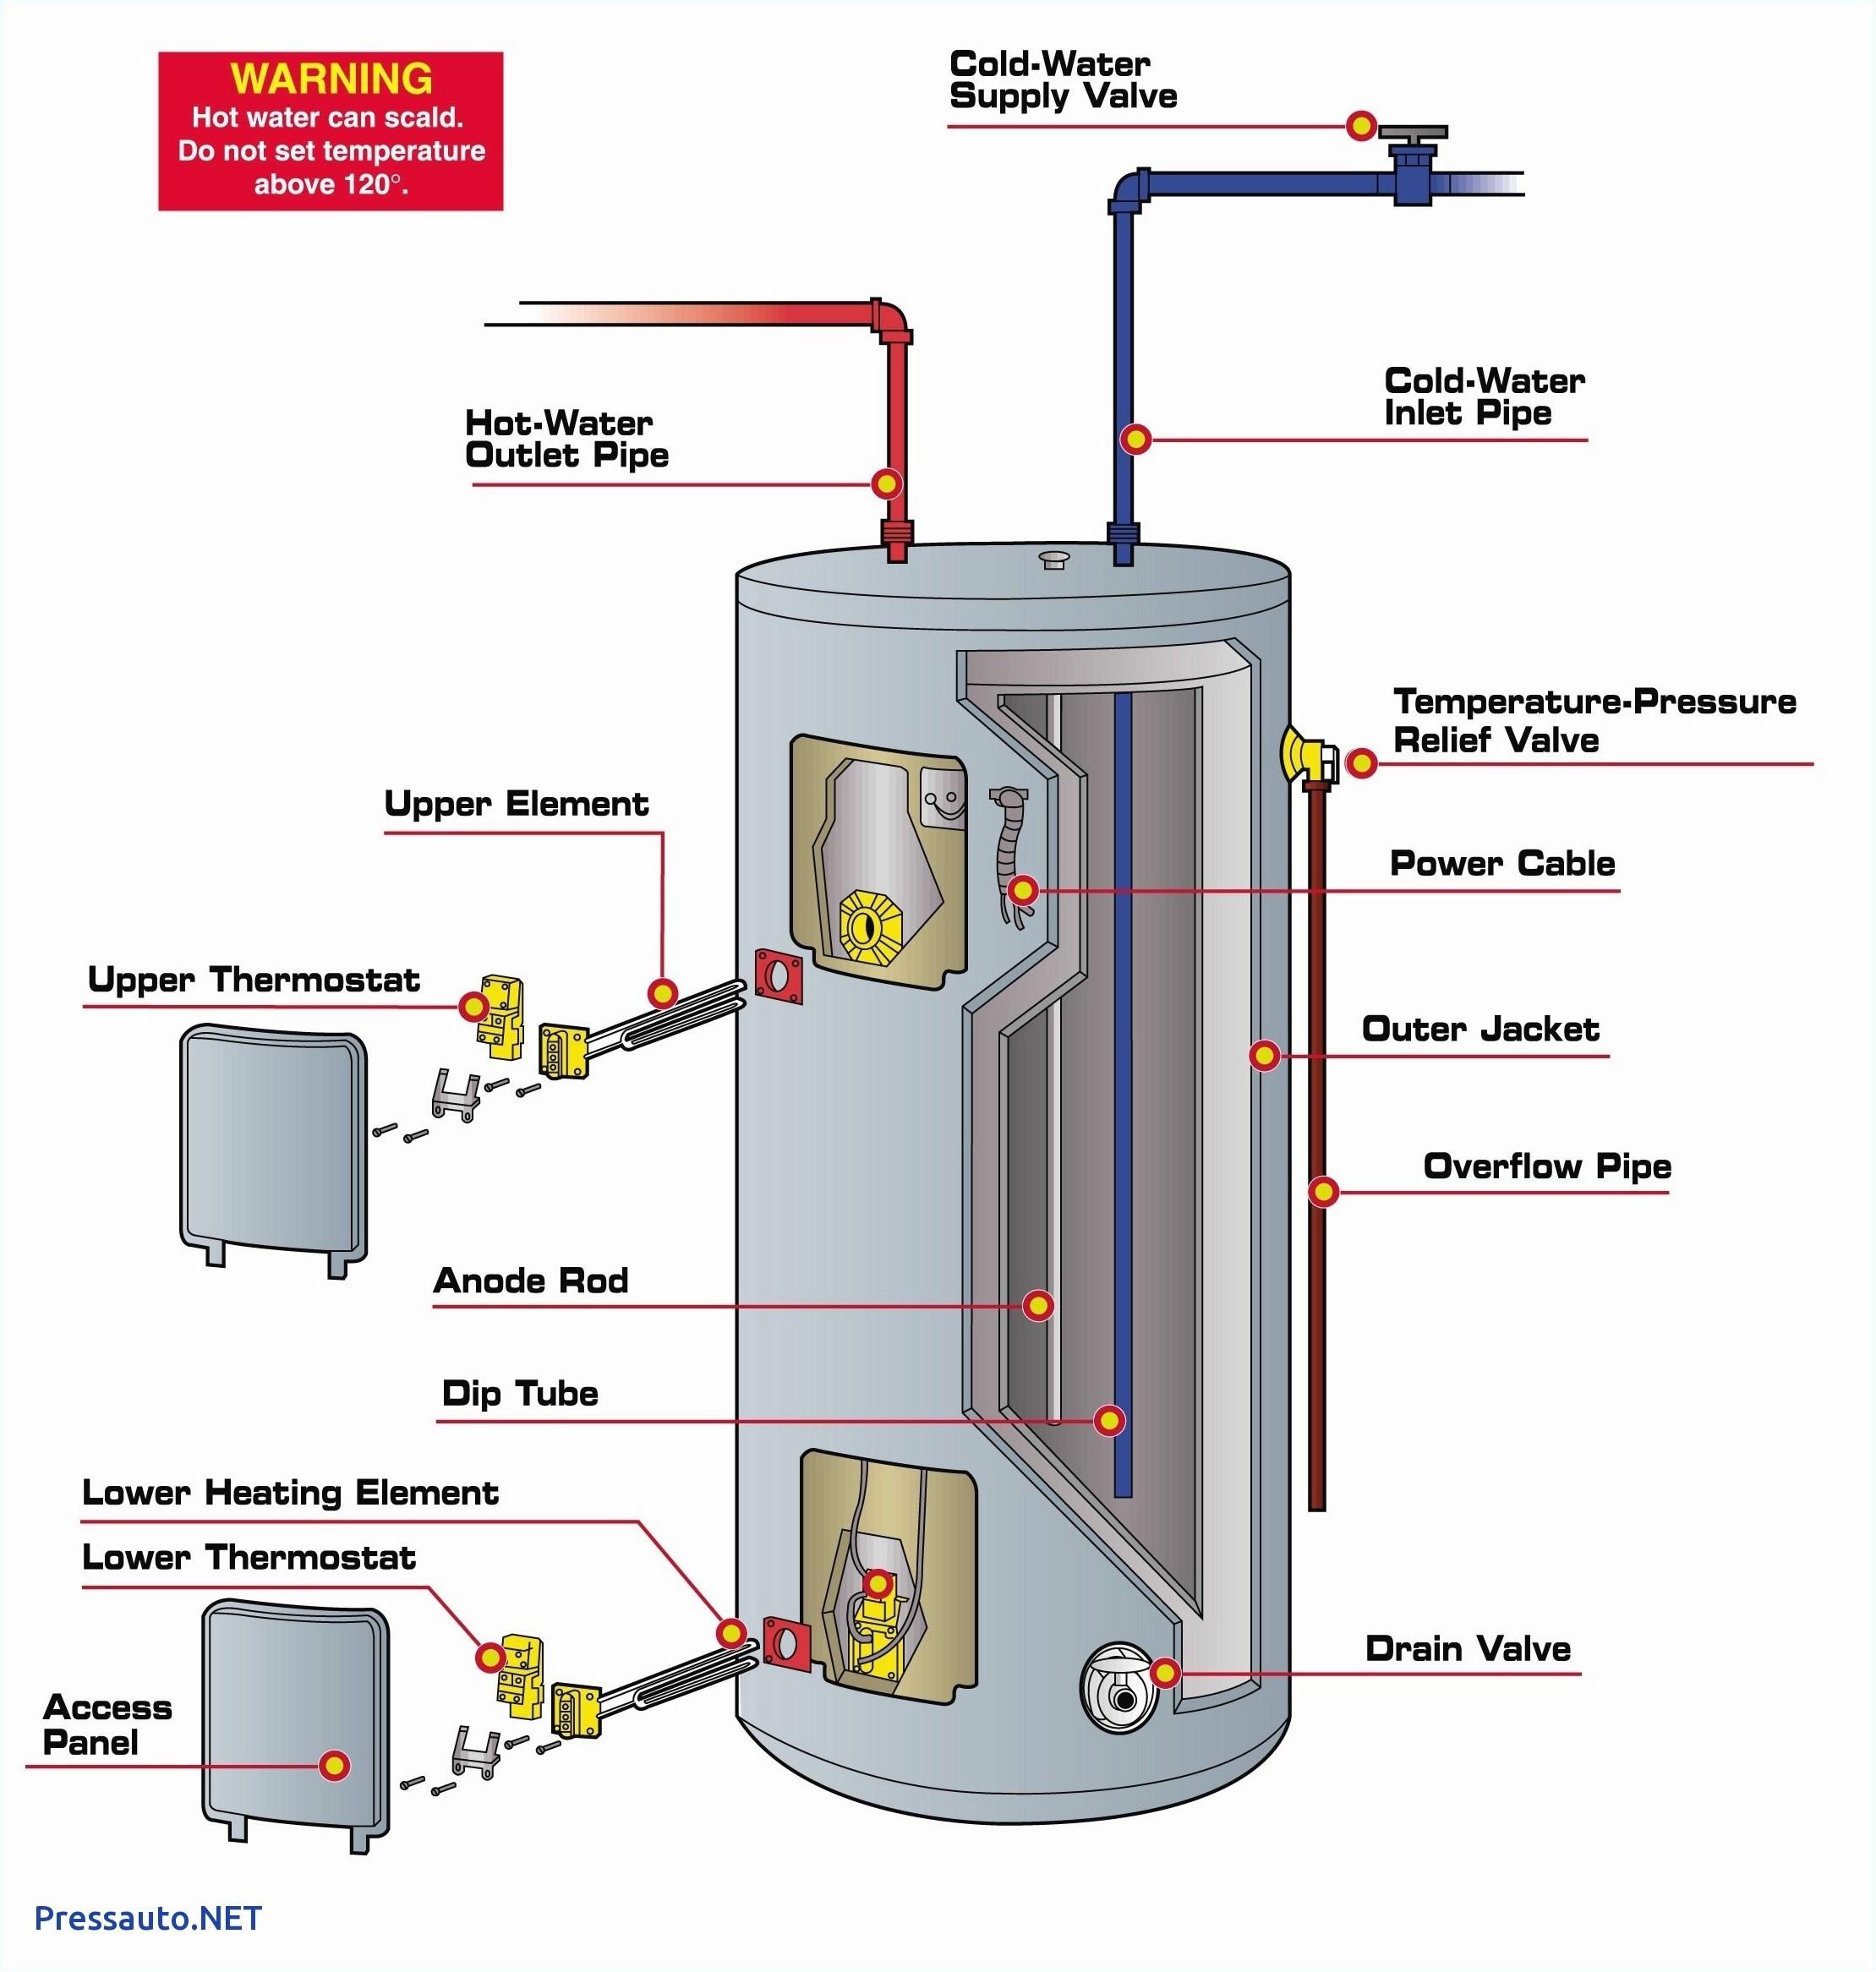 schematic wiring hot blog wiring diagram hot diagram water wiring heater e82766718